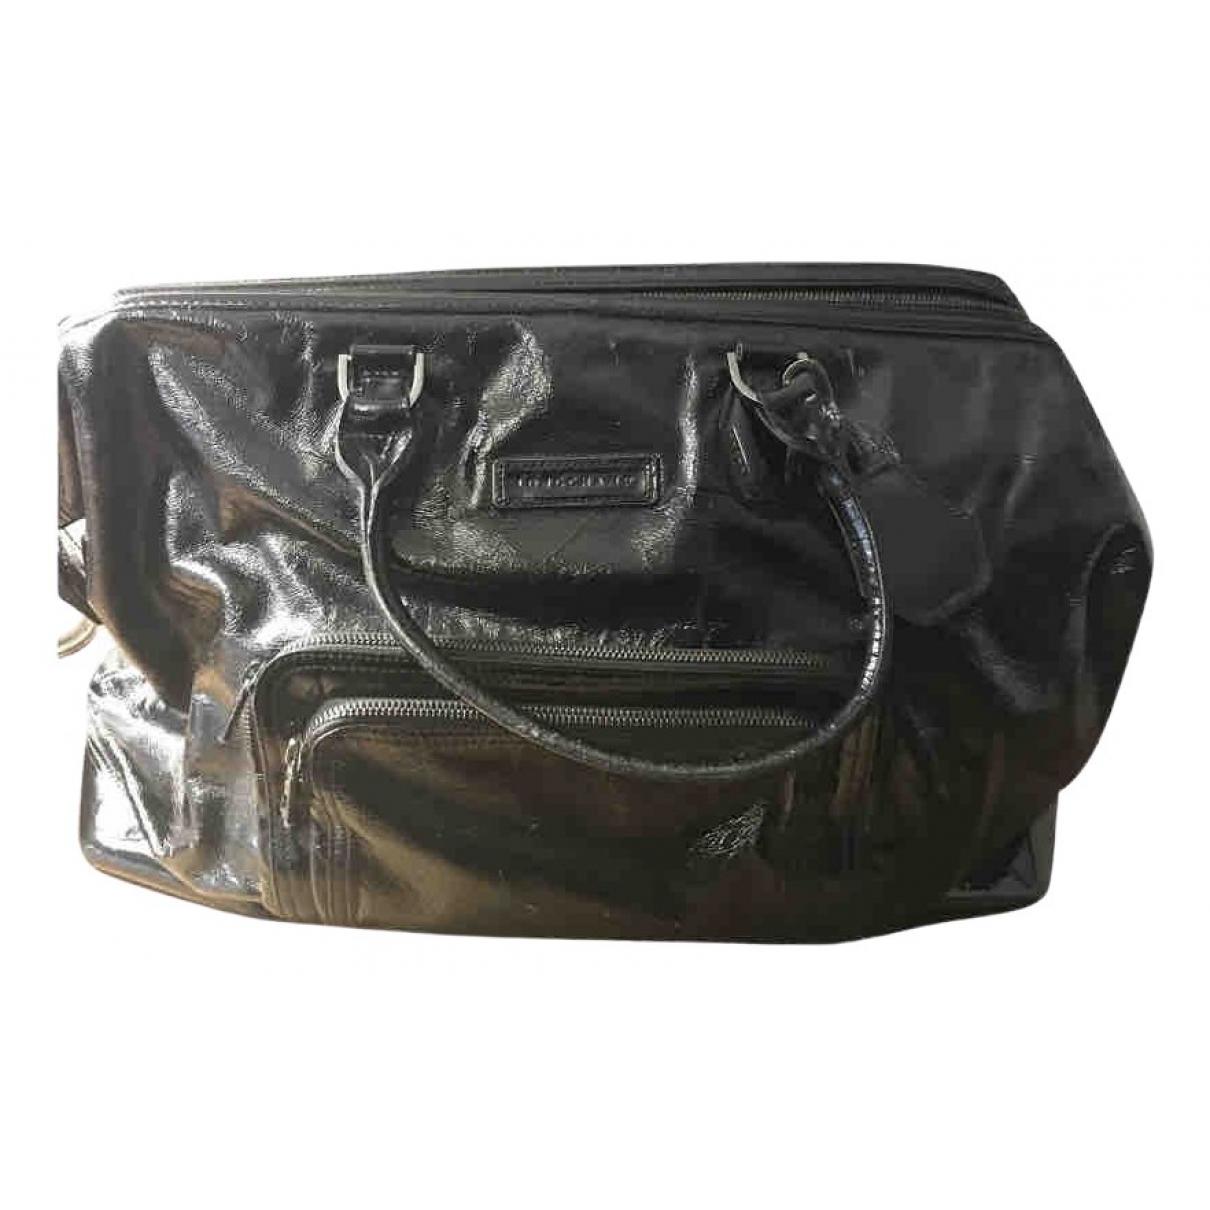 Longchamp Legende Handtasche in  Schwarz Lackleder